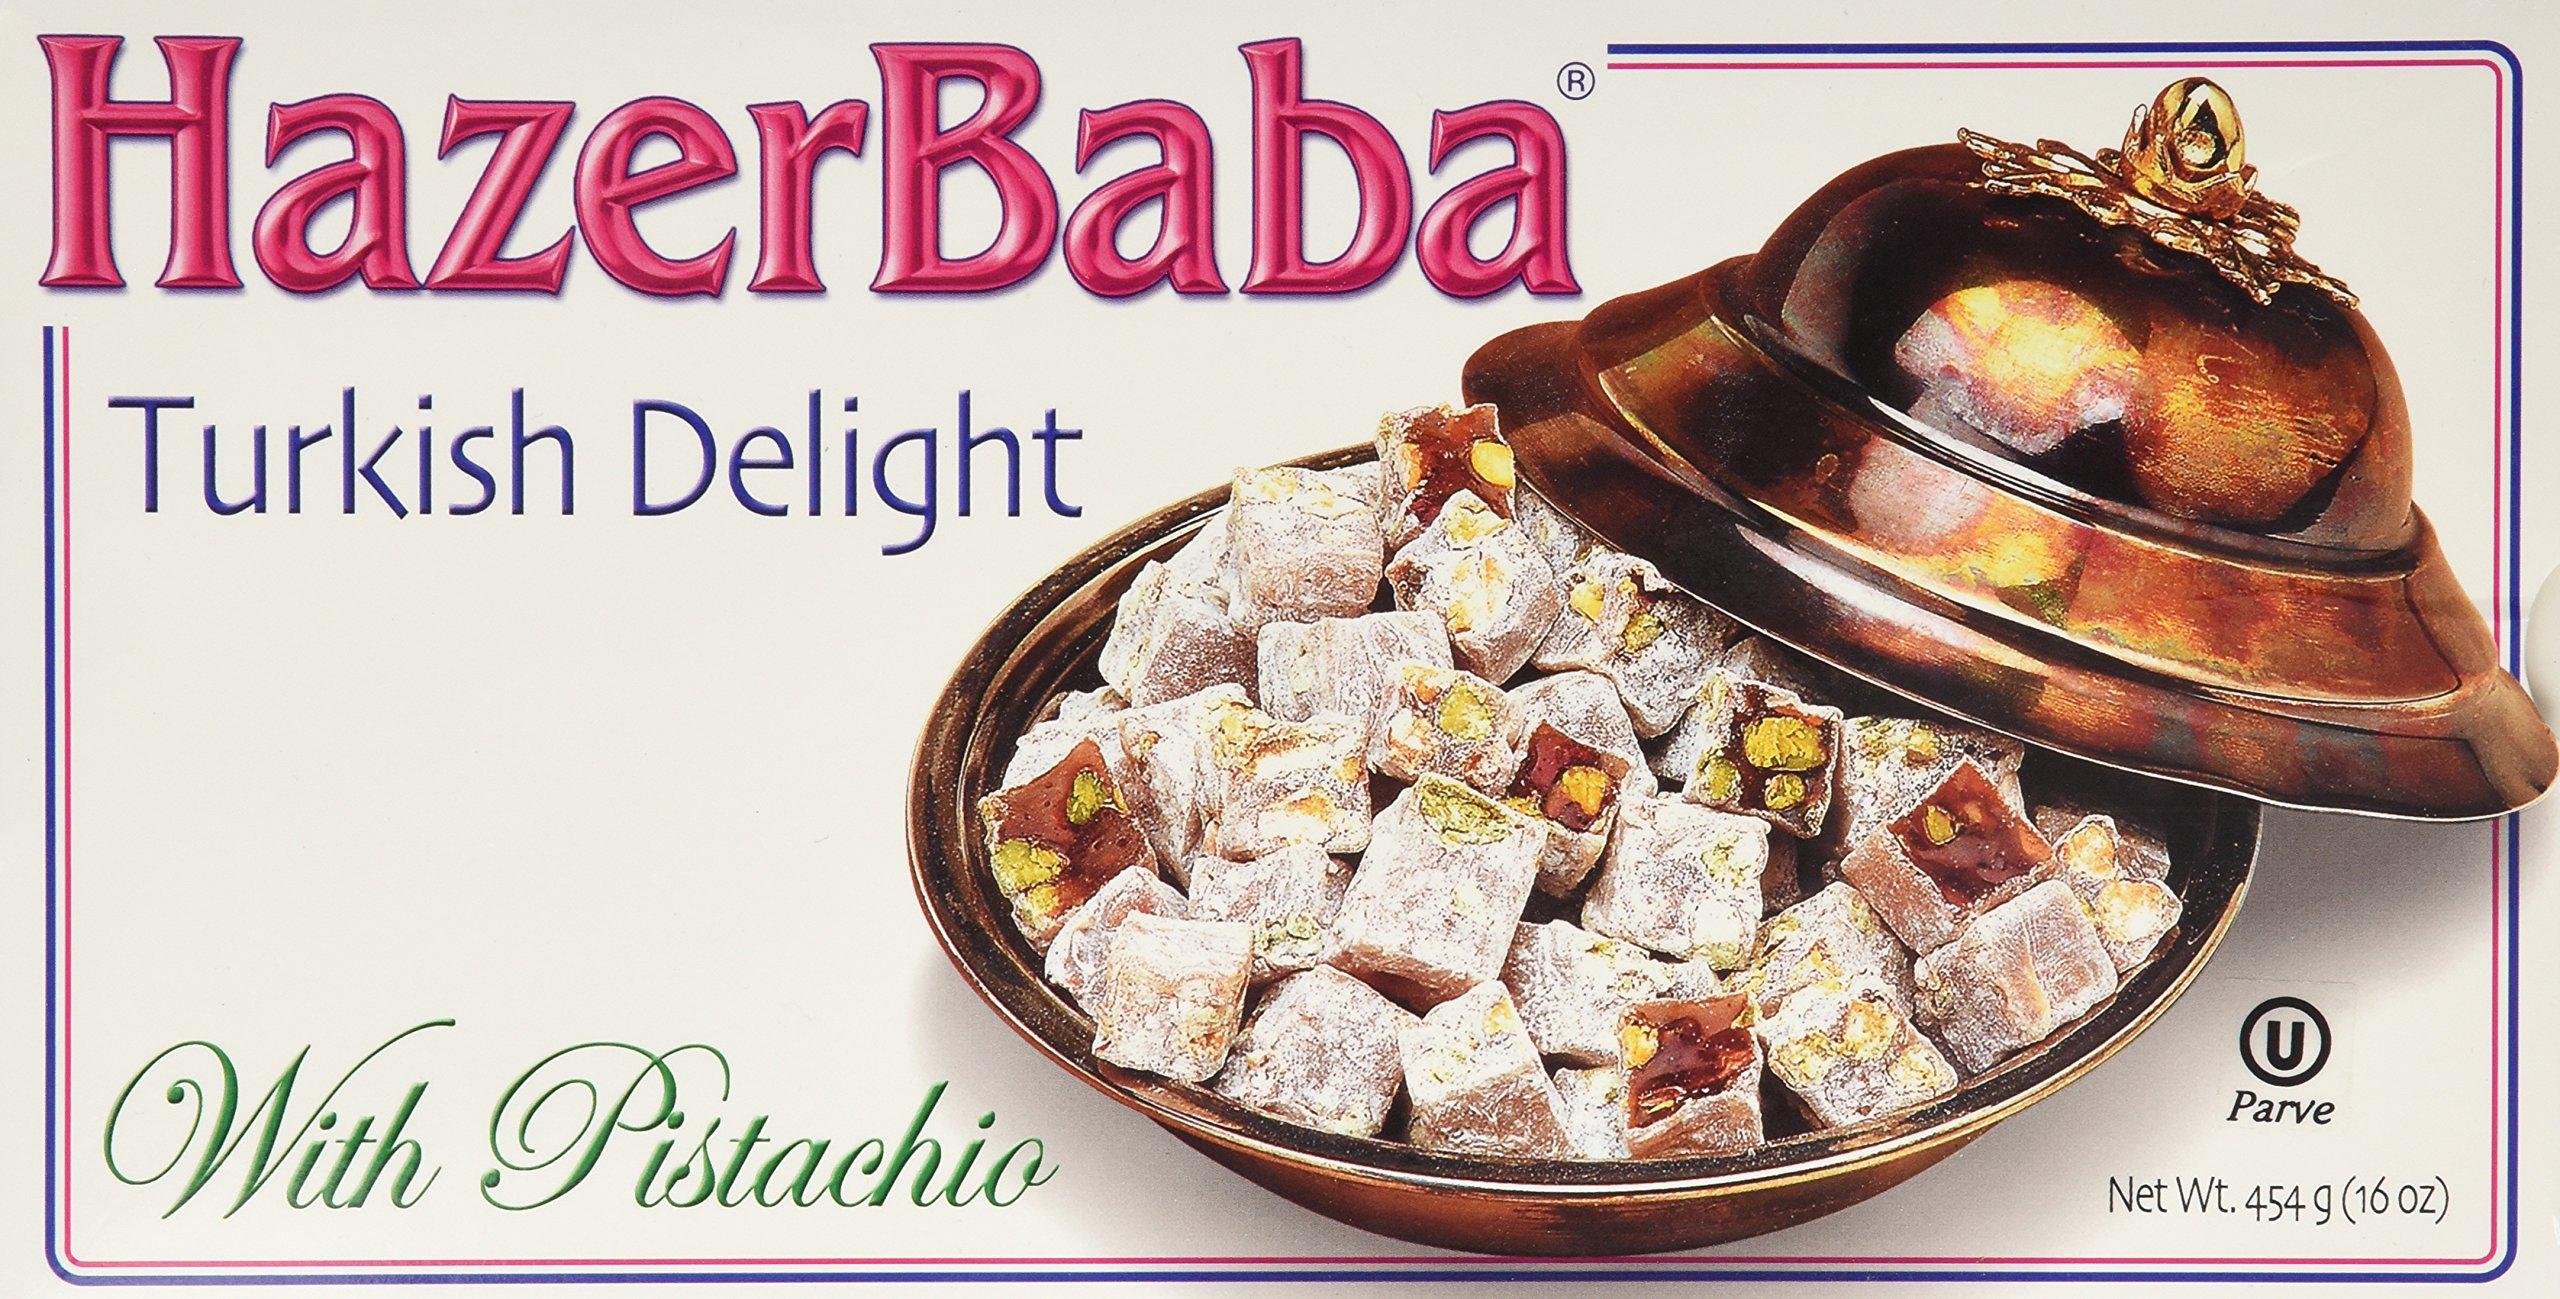 Hazer Baba Turkish Delight With Pistachio, 16oz